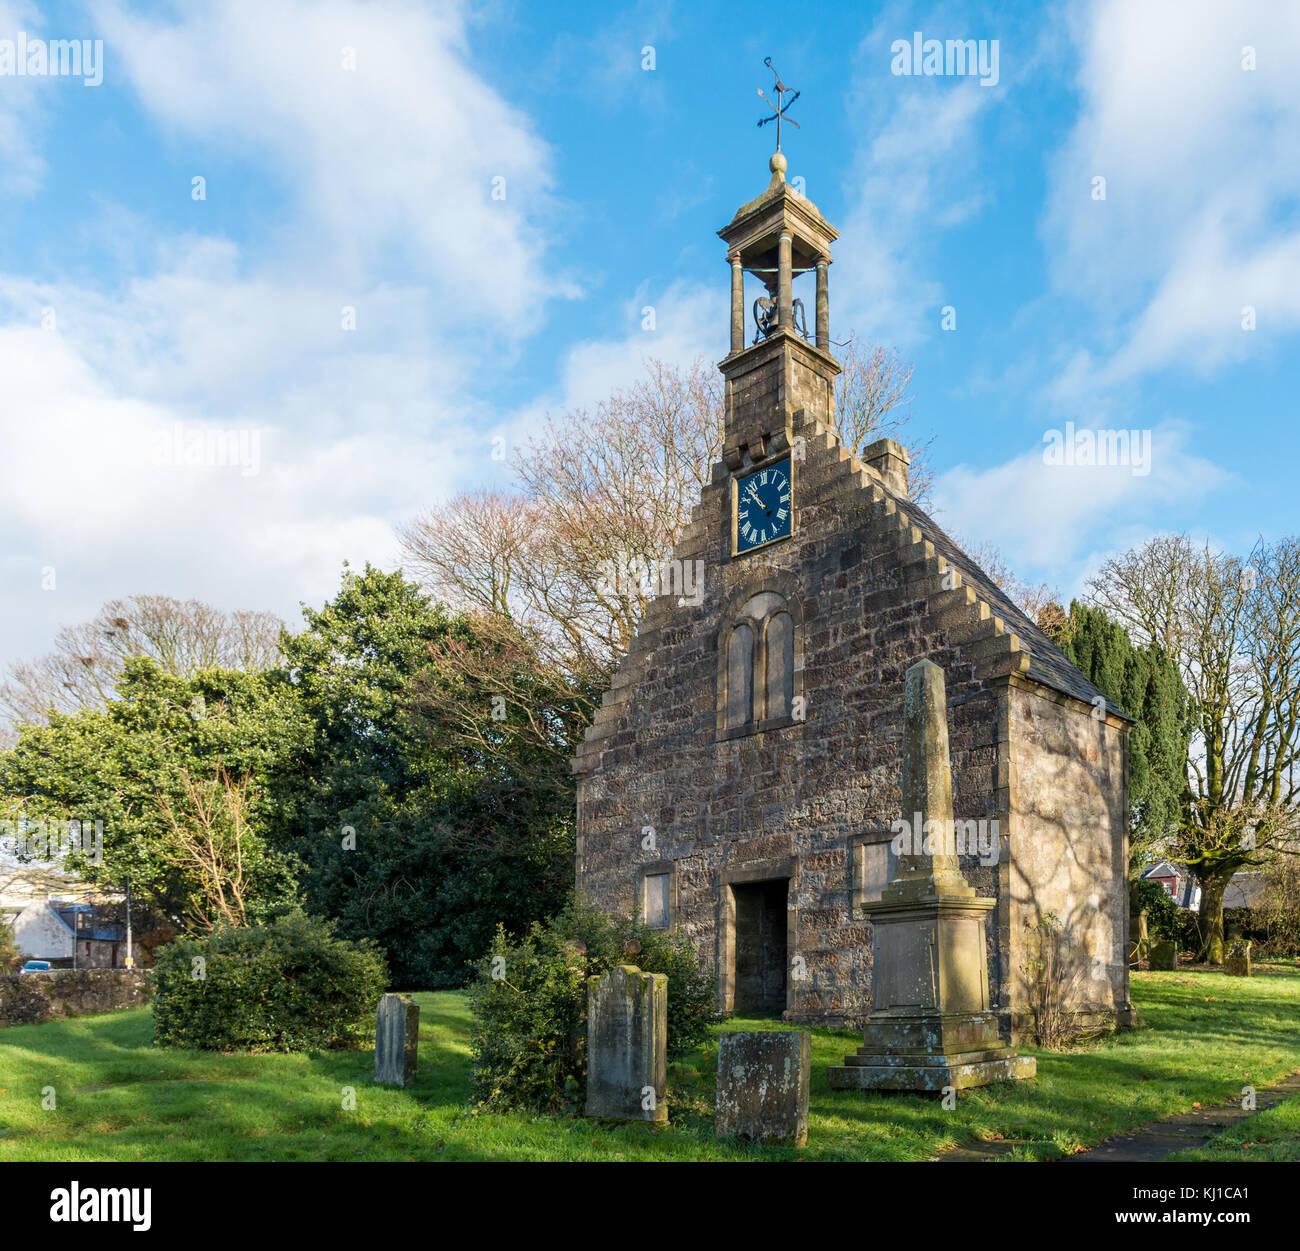 Lochwinnoch,Scotland,UK-November 18,2017: The early 18th-century St John's Church, also known as 'Auld Simon' - Stock Image